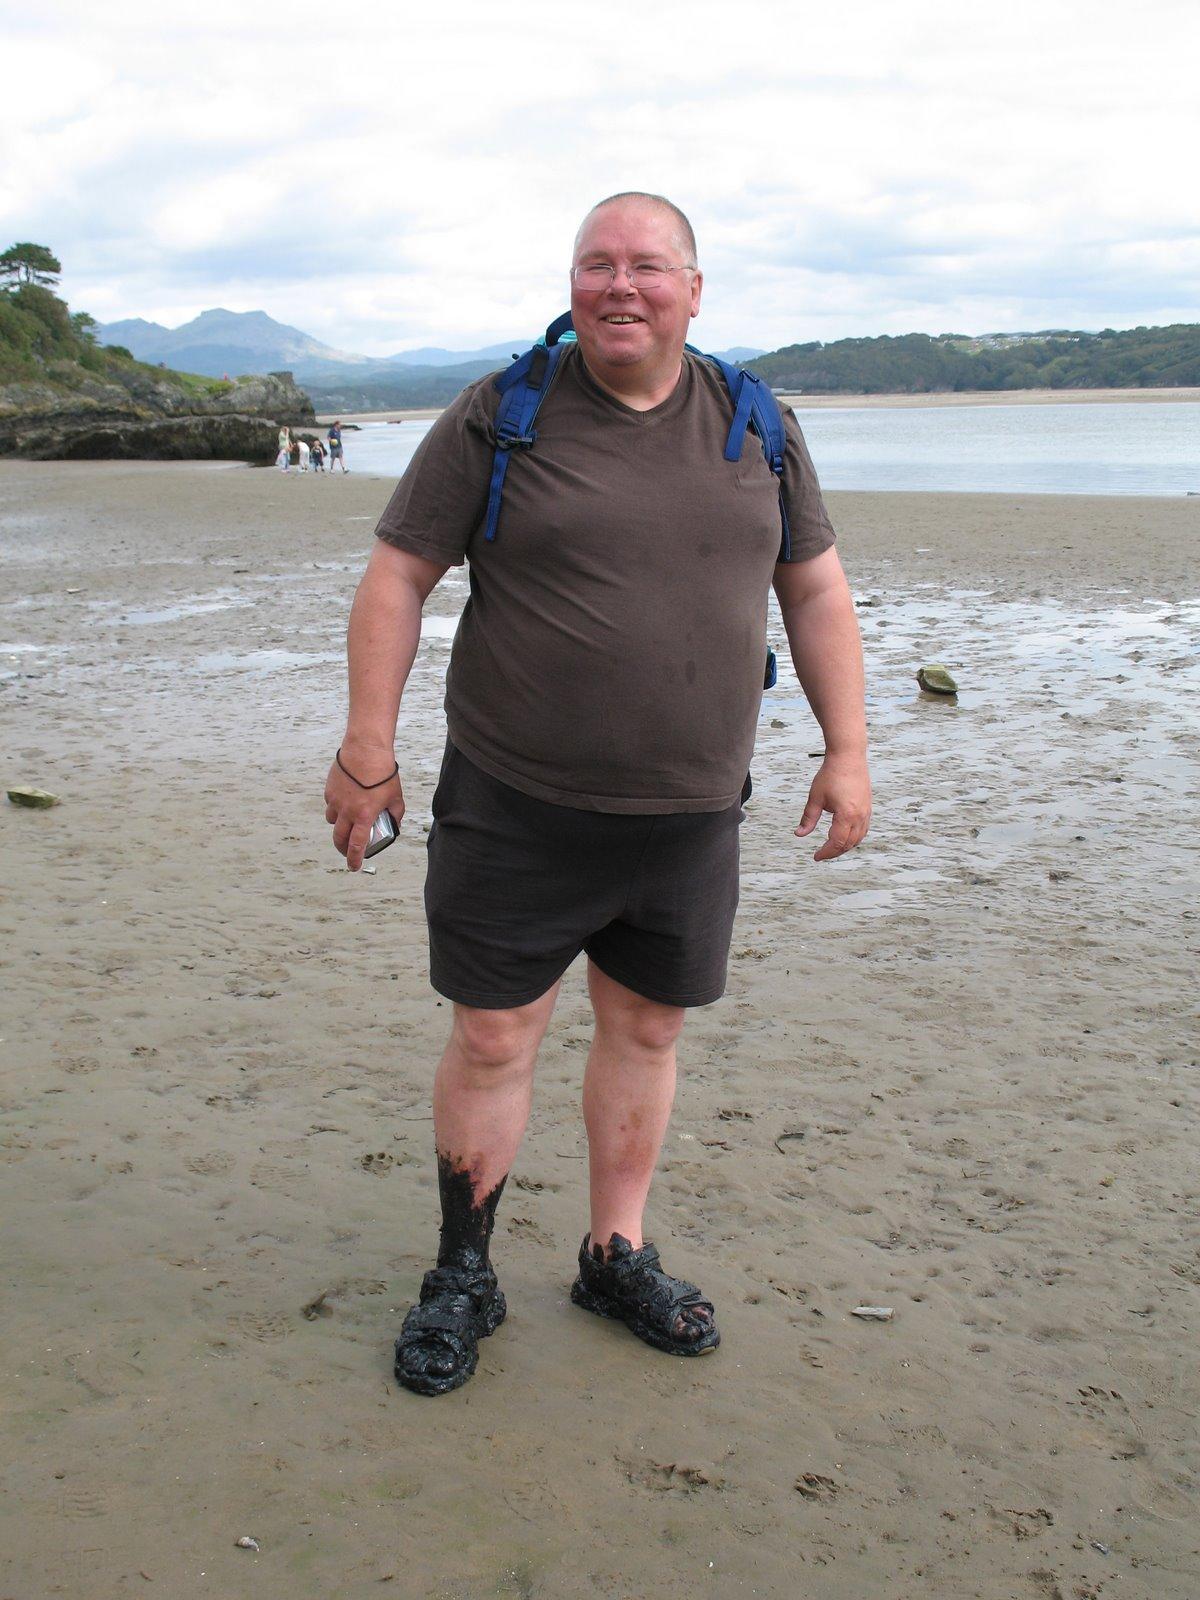 Nick on the beach near Porthmadog